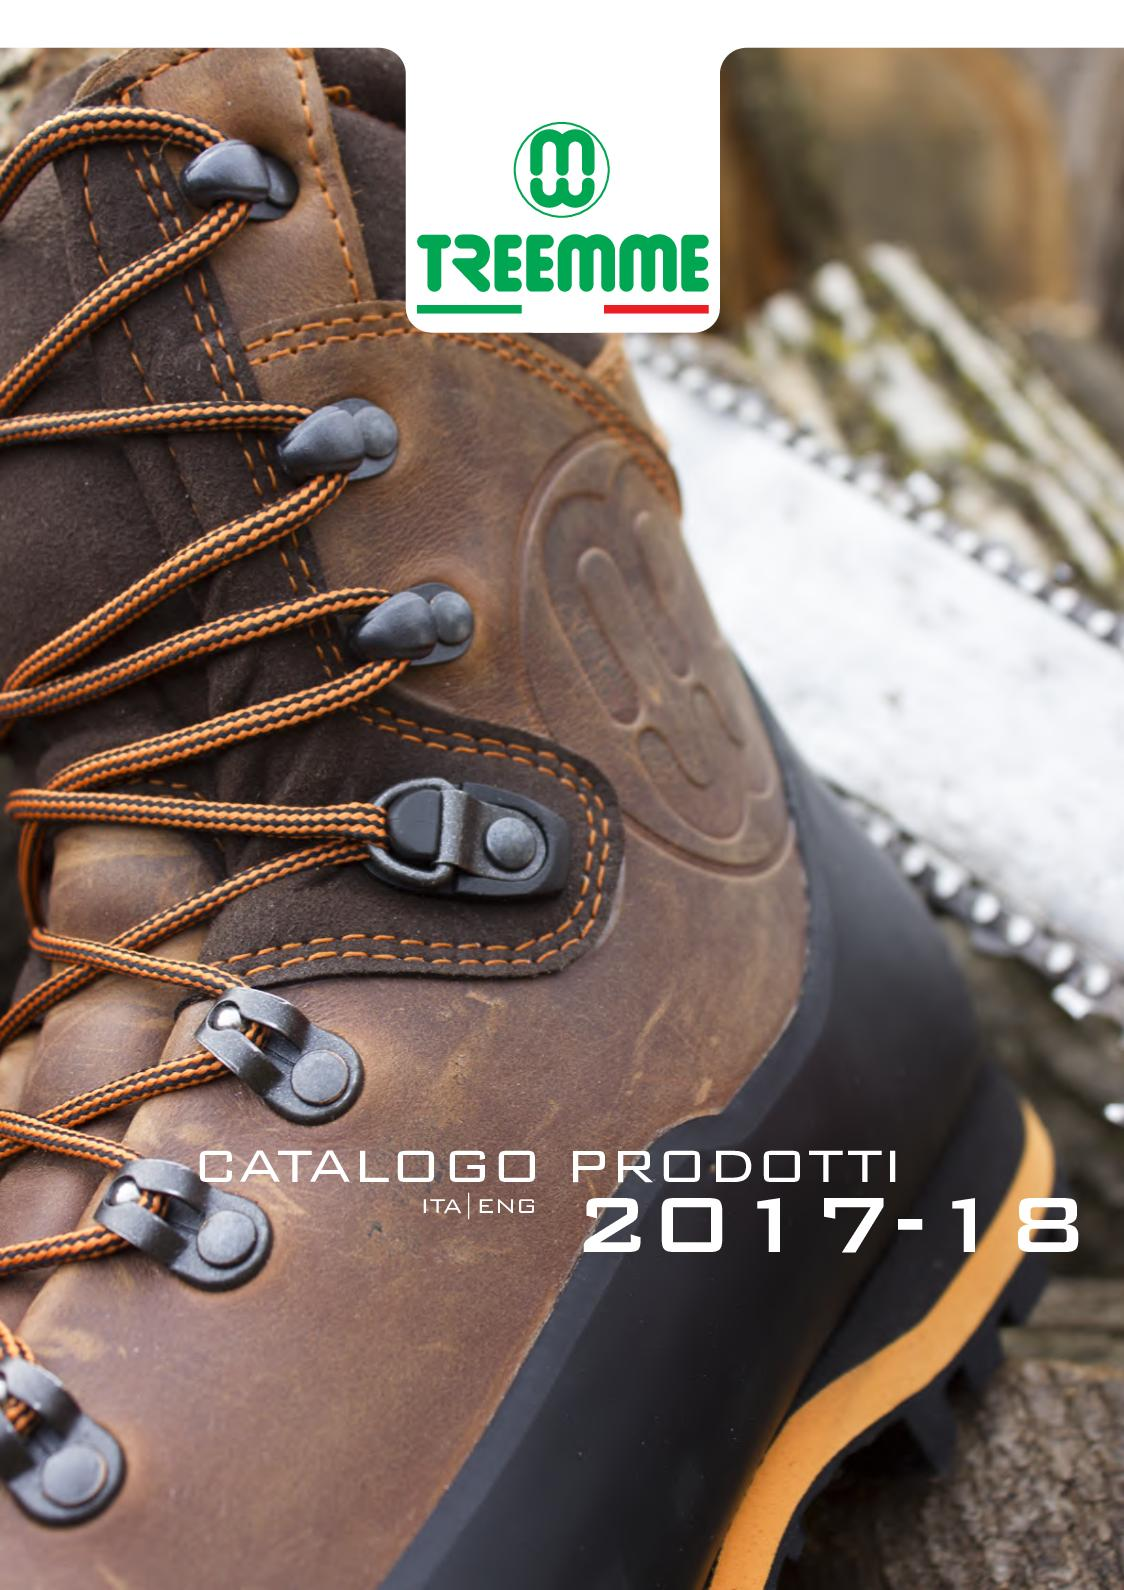 c6dcc2510 Calaméo - Treemme Catalogo 2017